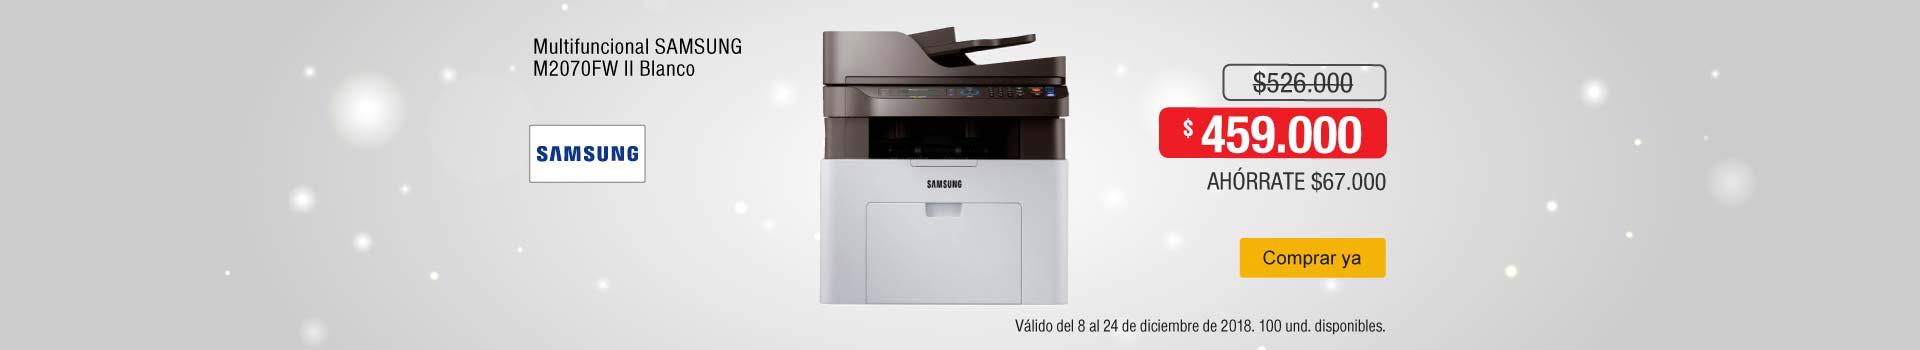 AK-KT-BCAT-1-impresion-PP---Samsung-Multifuncional M2070FW-dic12